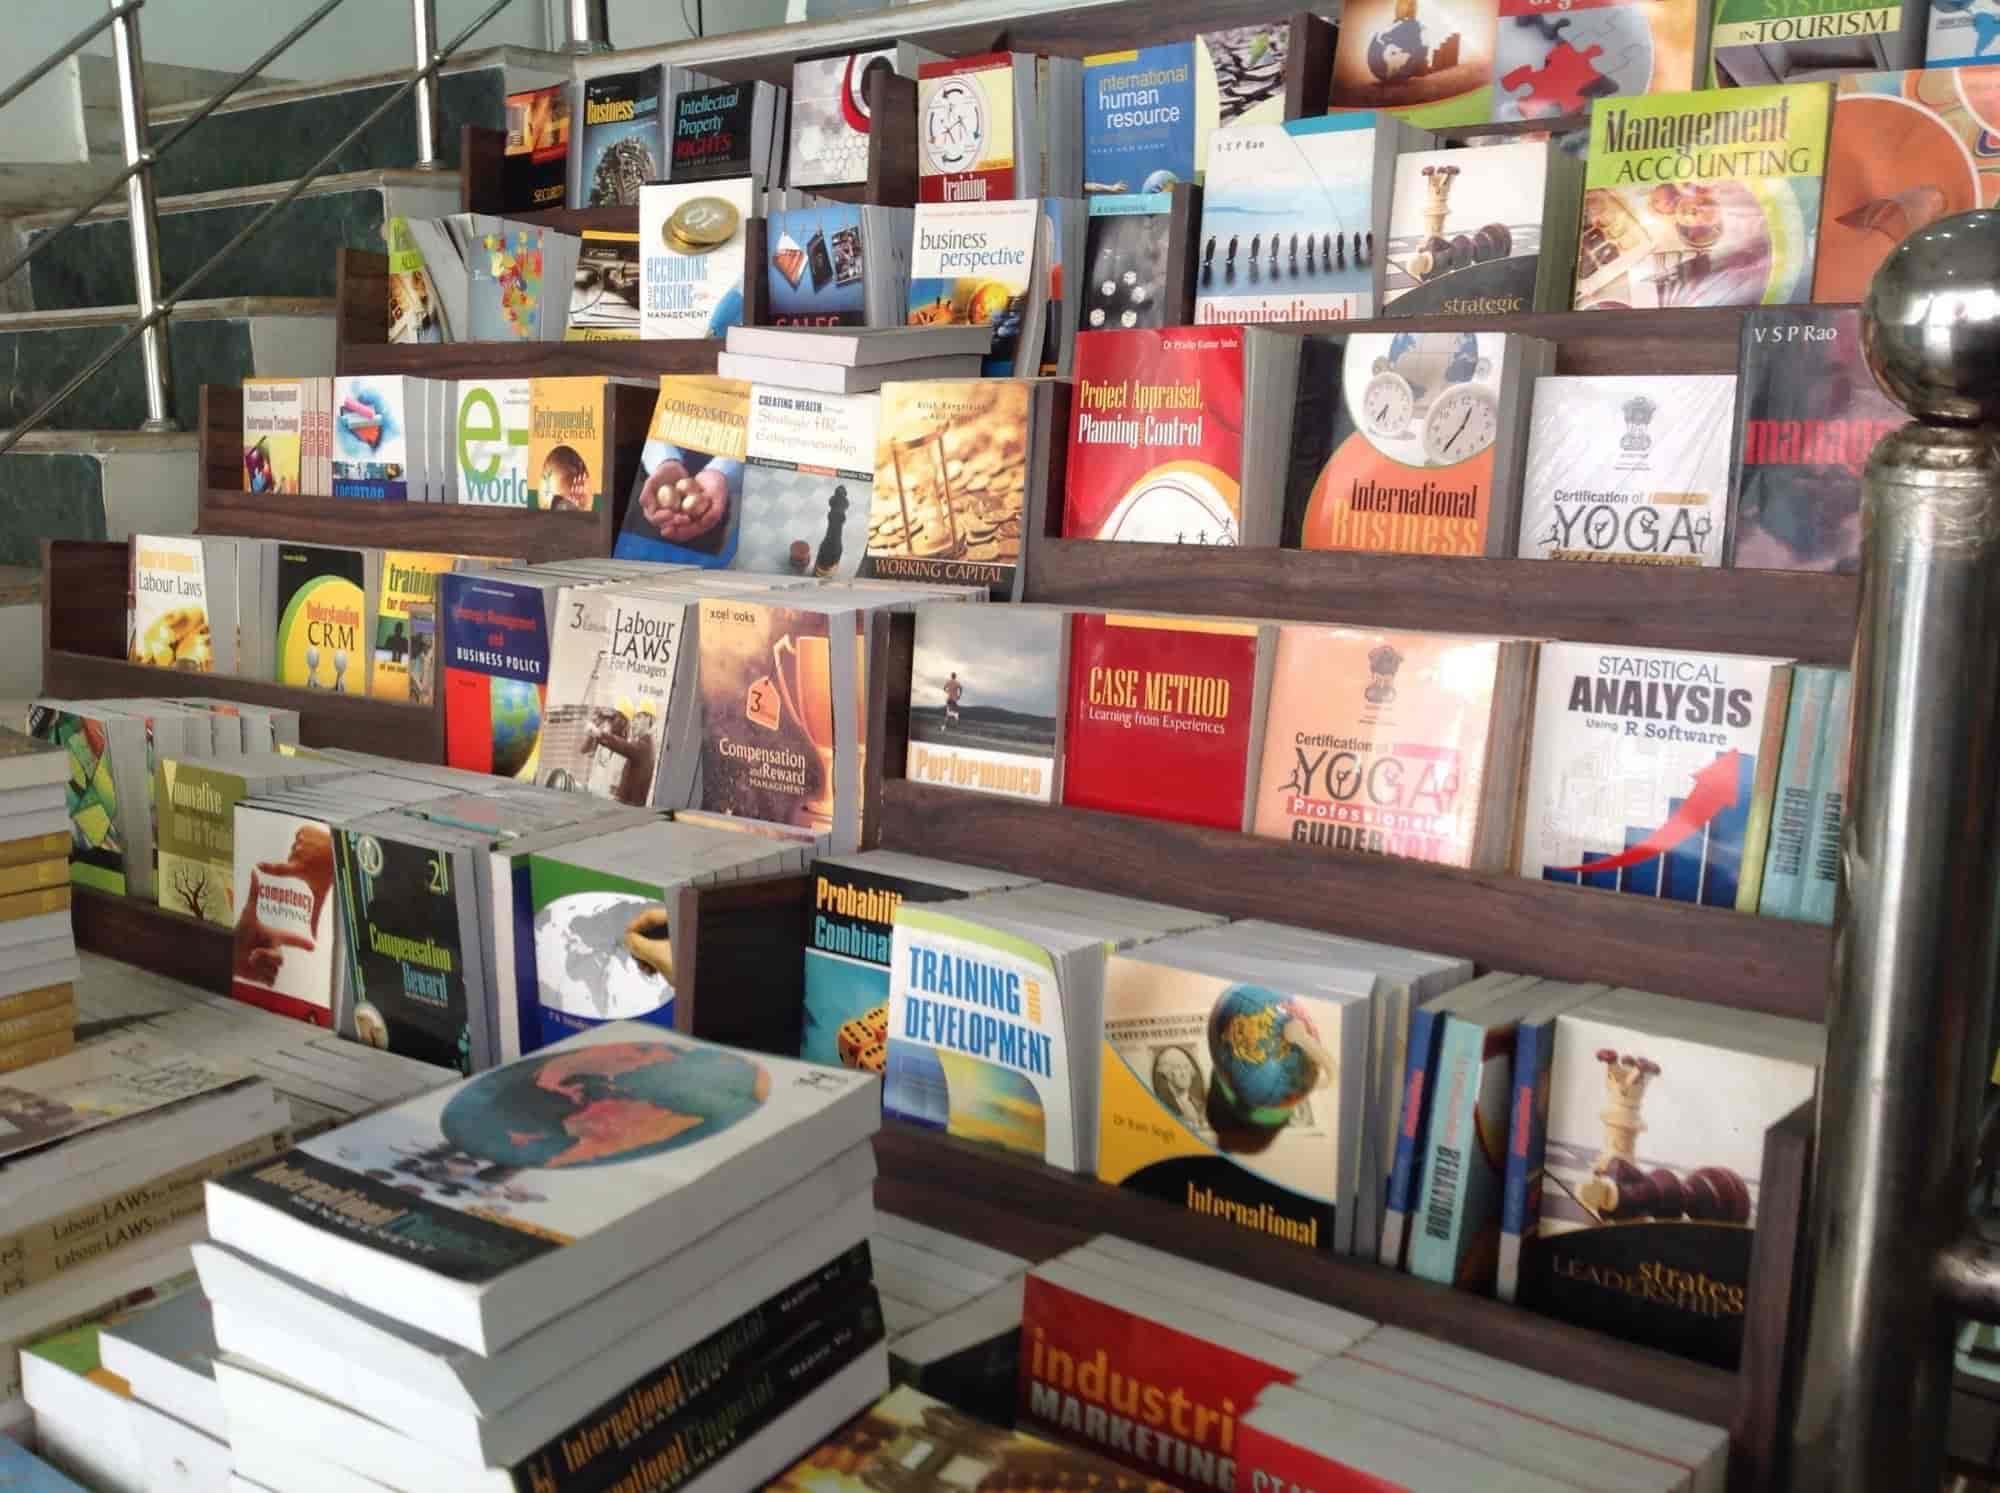 excel books pvtltd photos darya ganj delhi pictures images